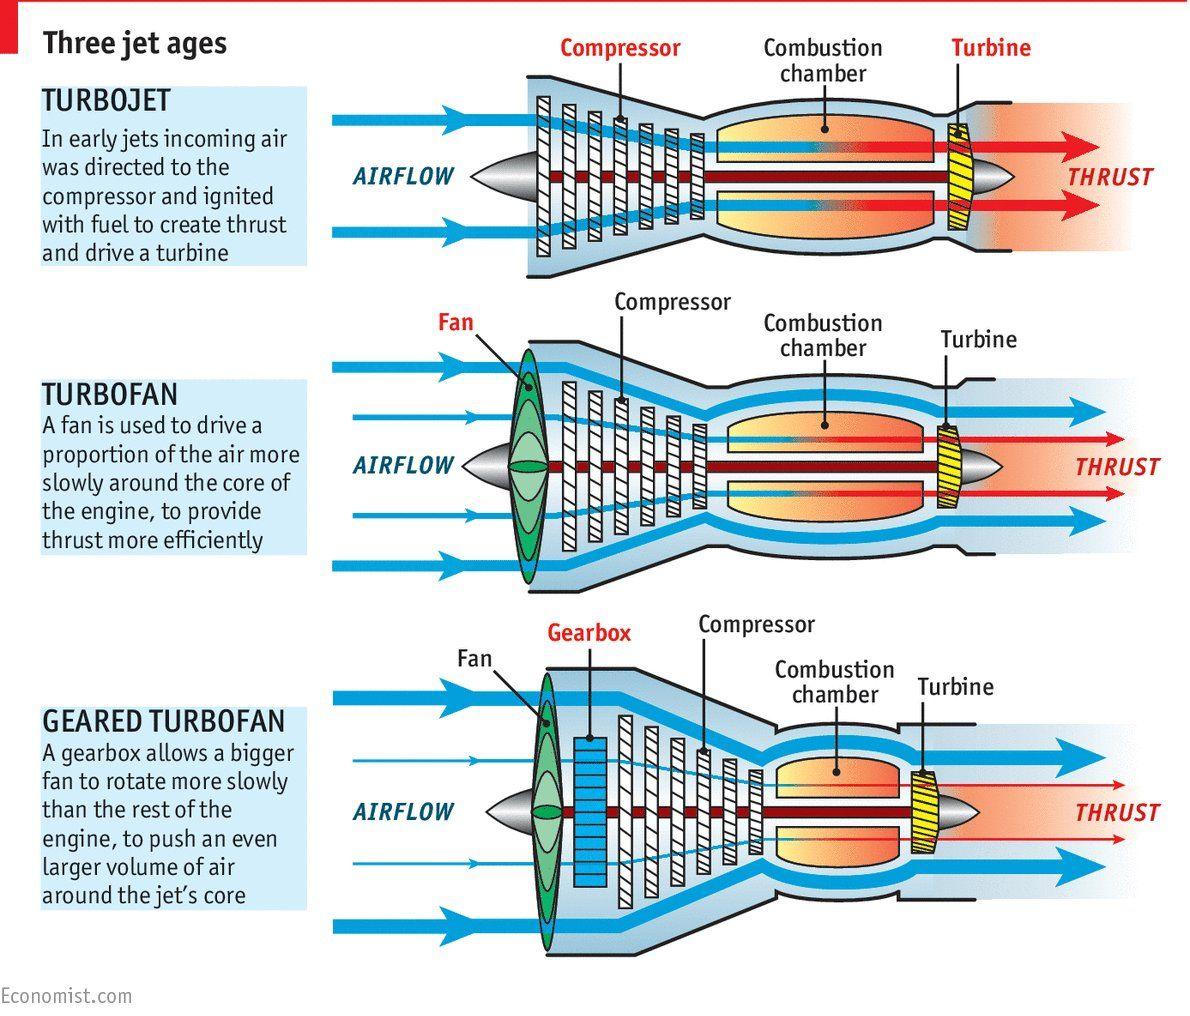 geared turbofans quieter more efficient slower fan tip speed yields less noise larger fan higher bypass ratio yields more thrust  [ 1190 x 1016 Pixel ]